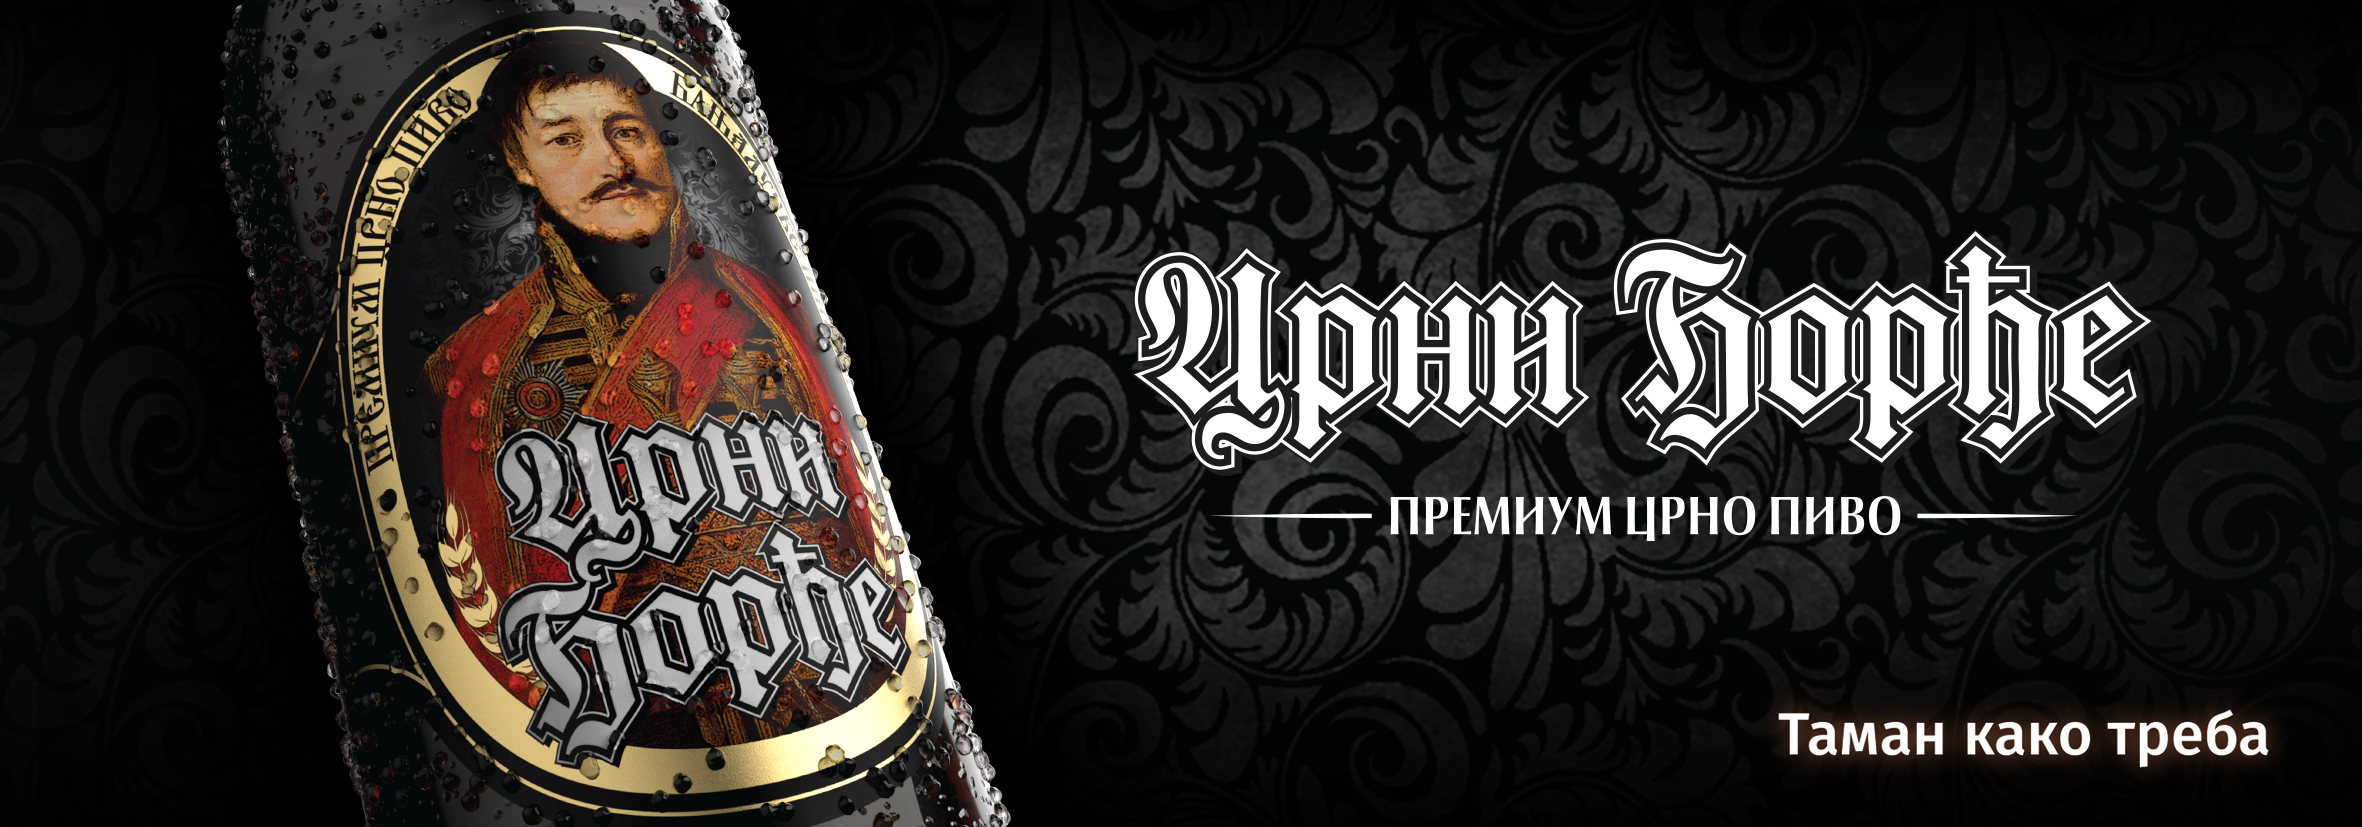 CDj-Taman kako treba-banner-2x0.7m.jpg